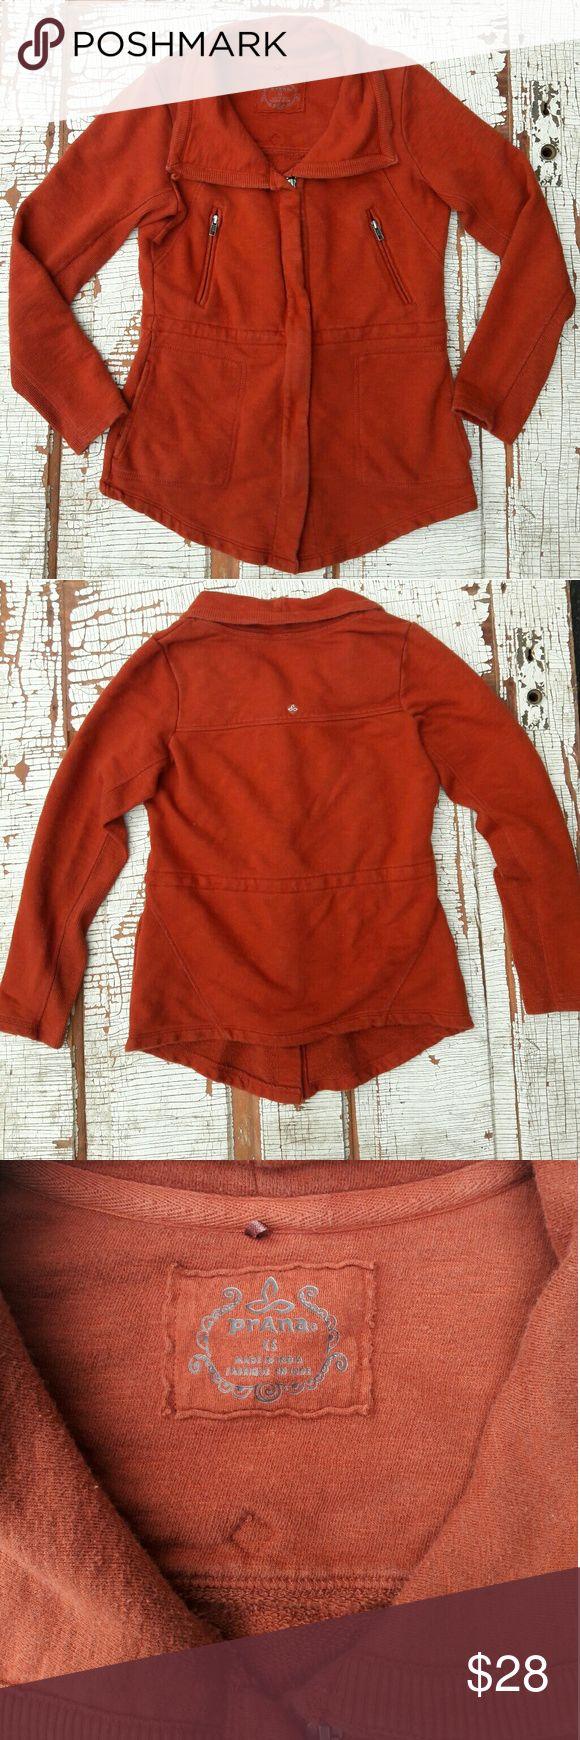 "Prana orange zip up sweatshirt xs Burnt orange Prana zip sweatshirt jacket with 2 zippered pockets and 2 open pockets. A drawstring on the inside of this sweatshirt can give the wearer an extra flattering look  Shoulders- 15"" Bust-18"" Length- 24"" Arm Inseam-18"" Prana Tops Sweatshirts & Hoodies"